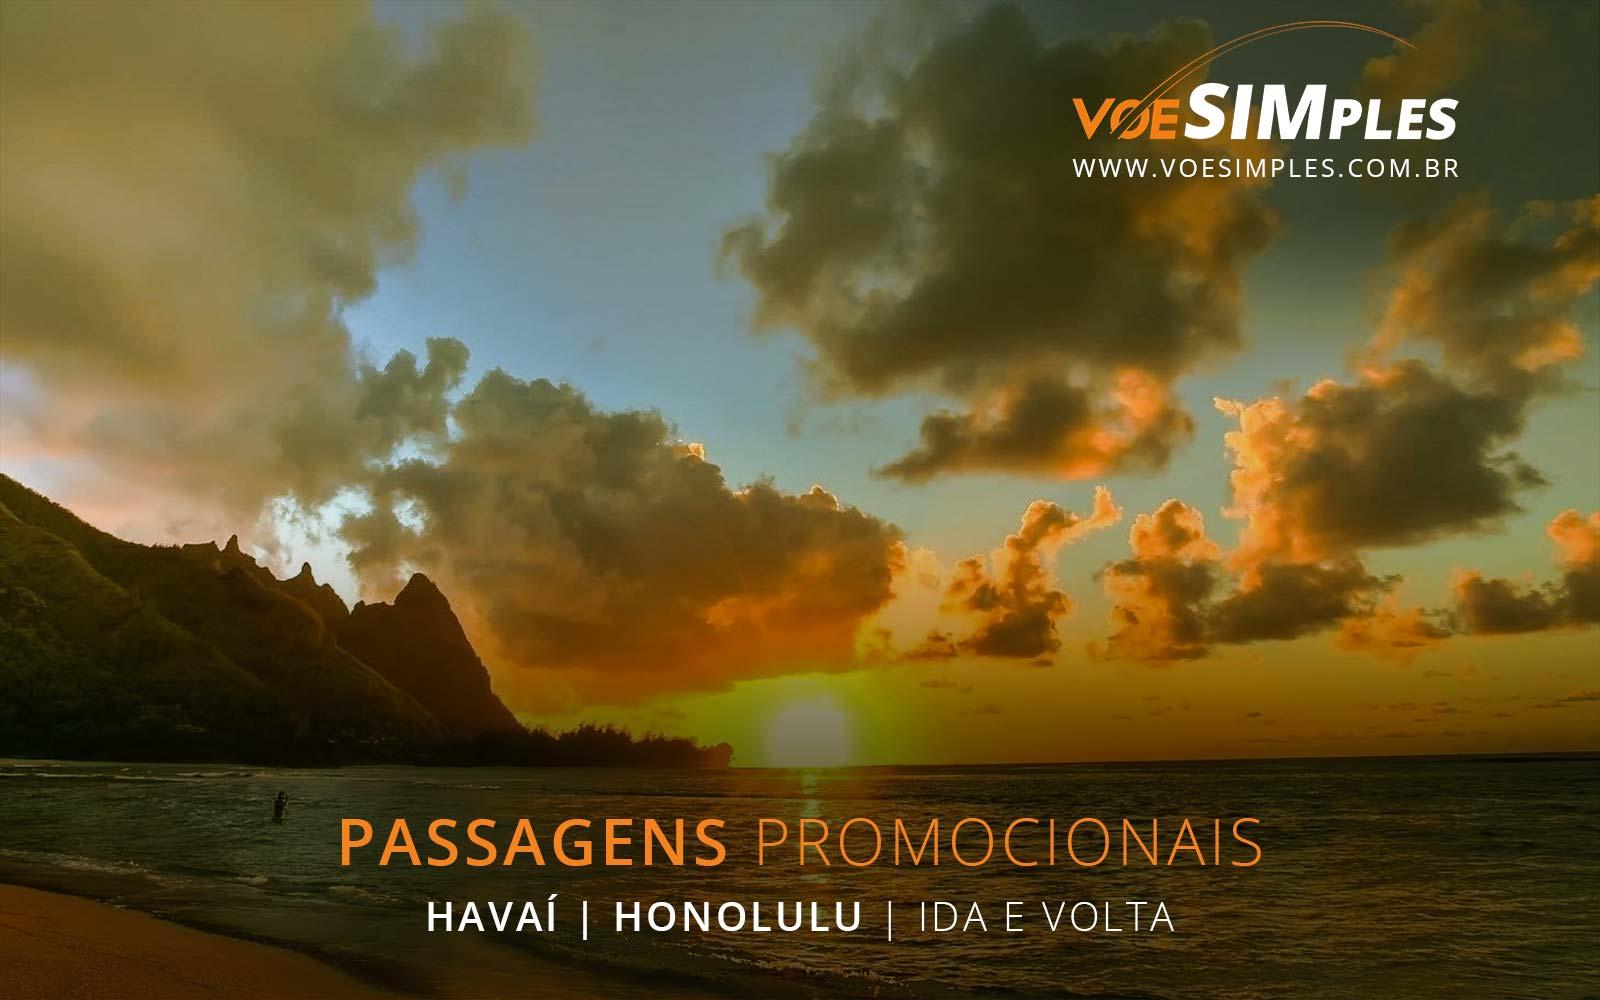 Passagens aéreas promocionais para Honolulu no Hawaii